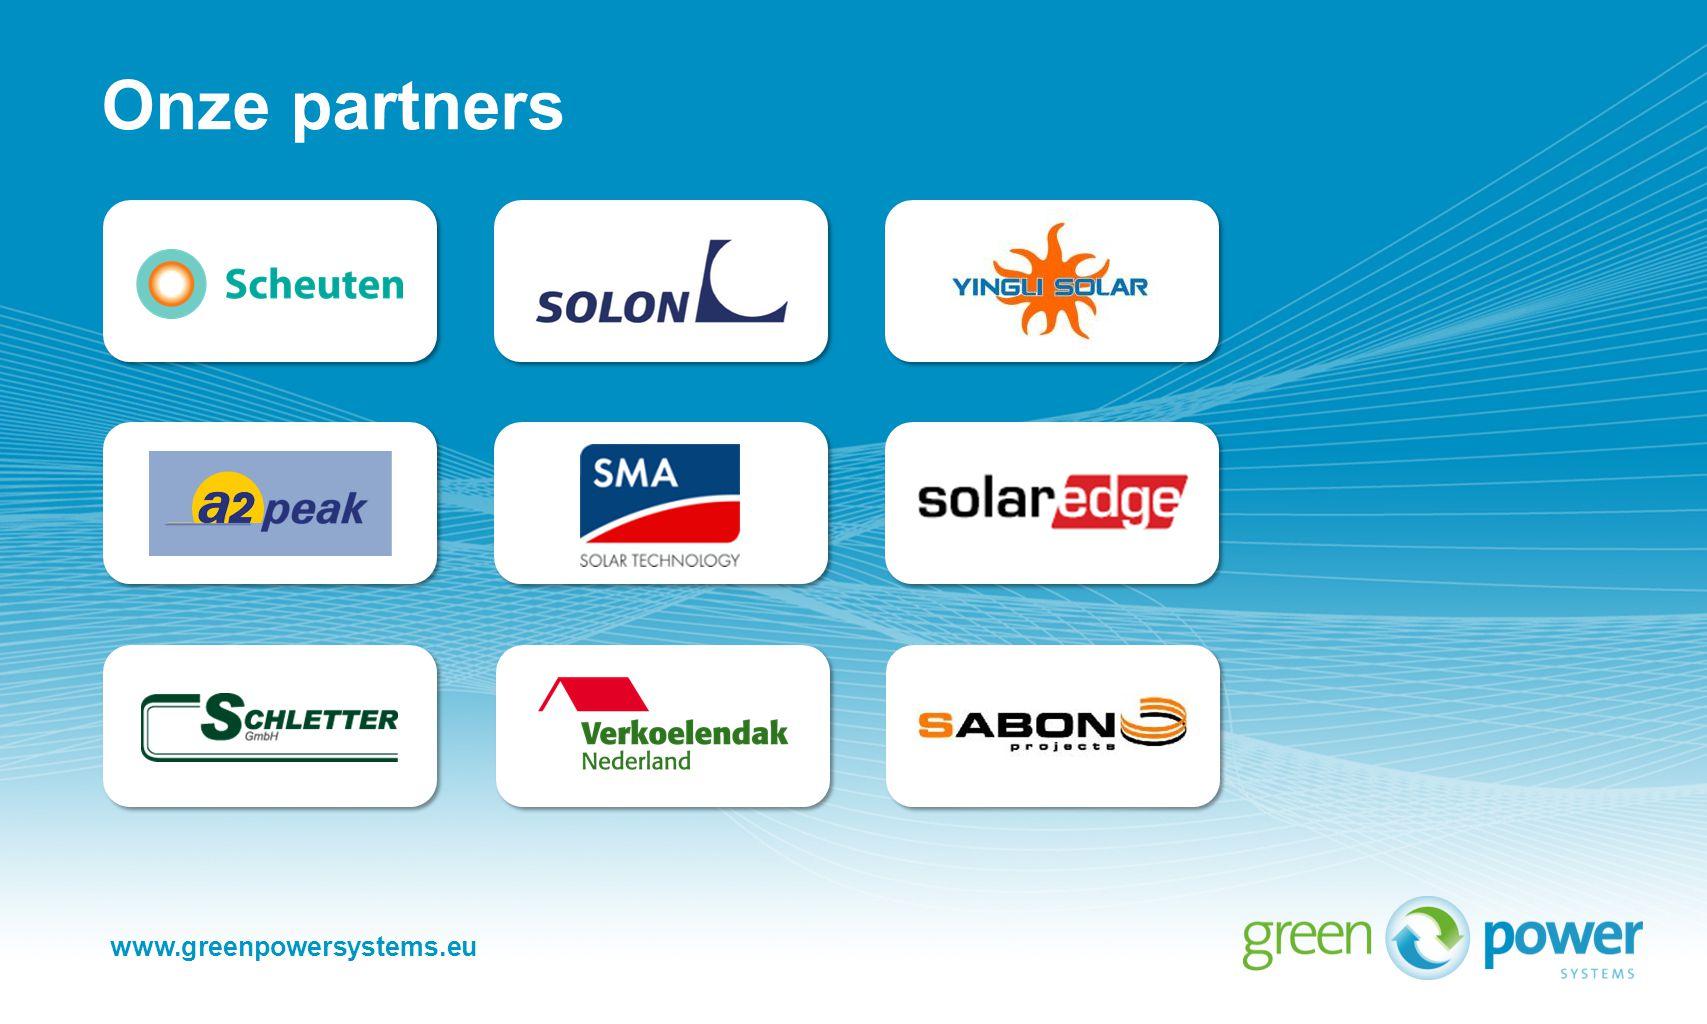 www.greenpowersystems.eu Onze partners